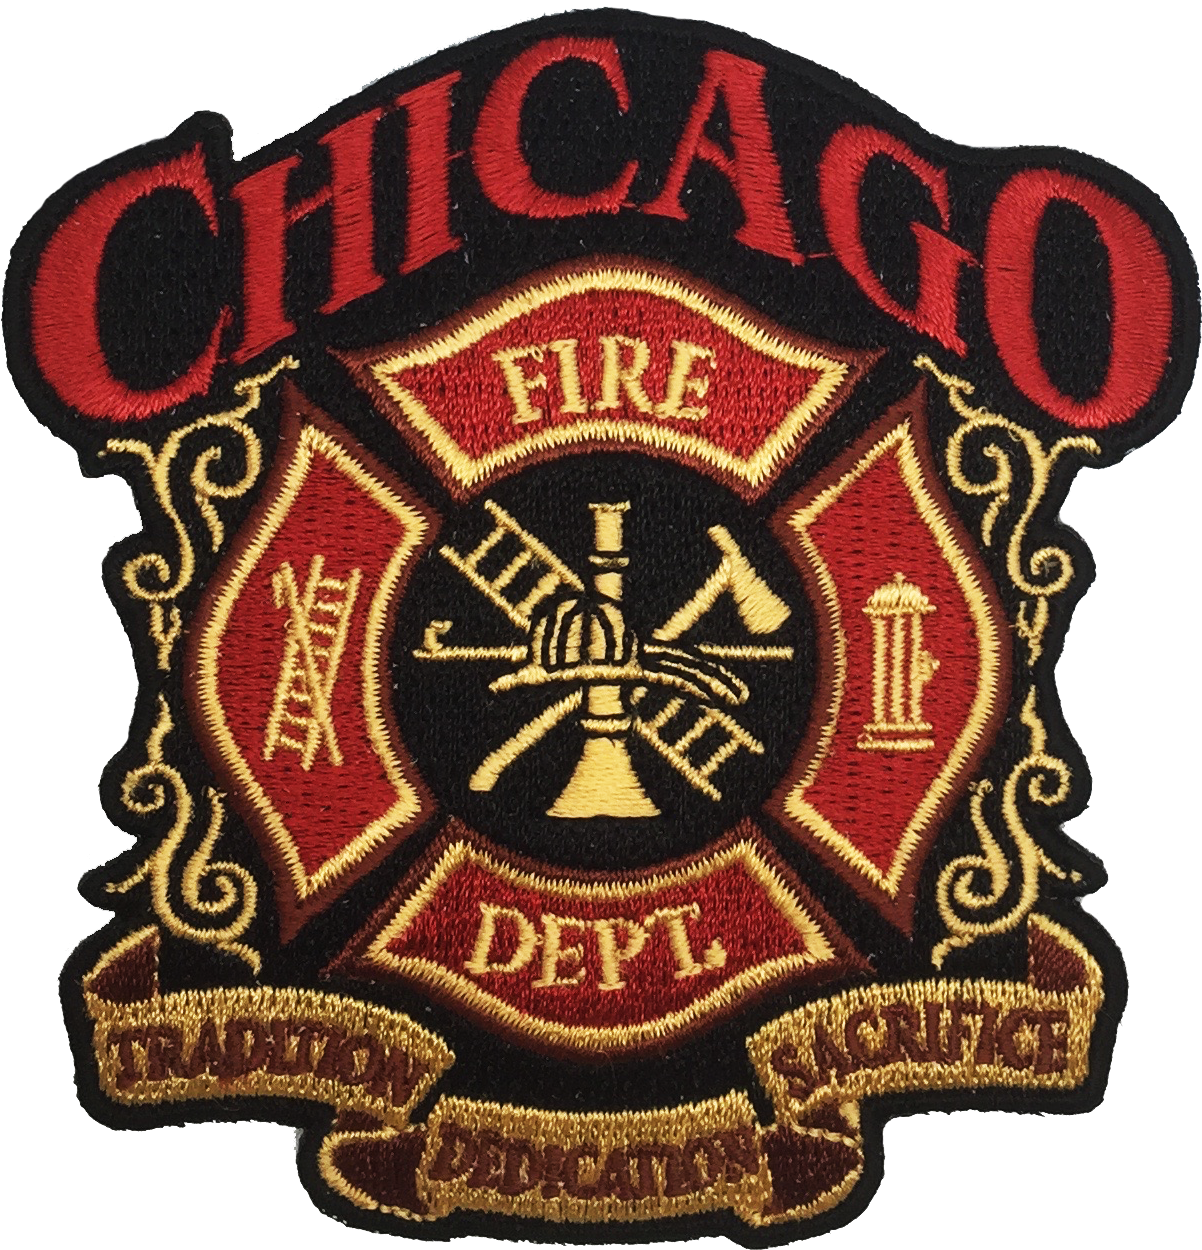 Https I Pinimg Com Originals A1 3c 89 A13c89f6fbfcfdcf623de1bbefee1764 Png Chicago Fire Department Fire Department Chicago Fire